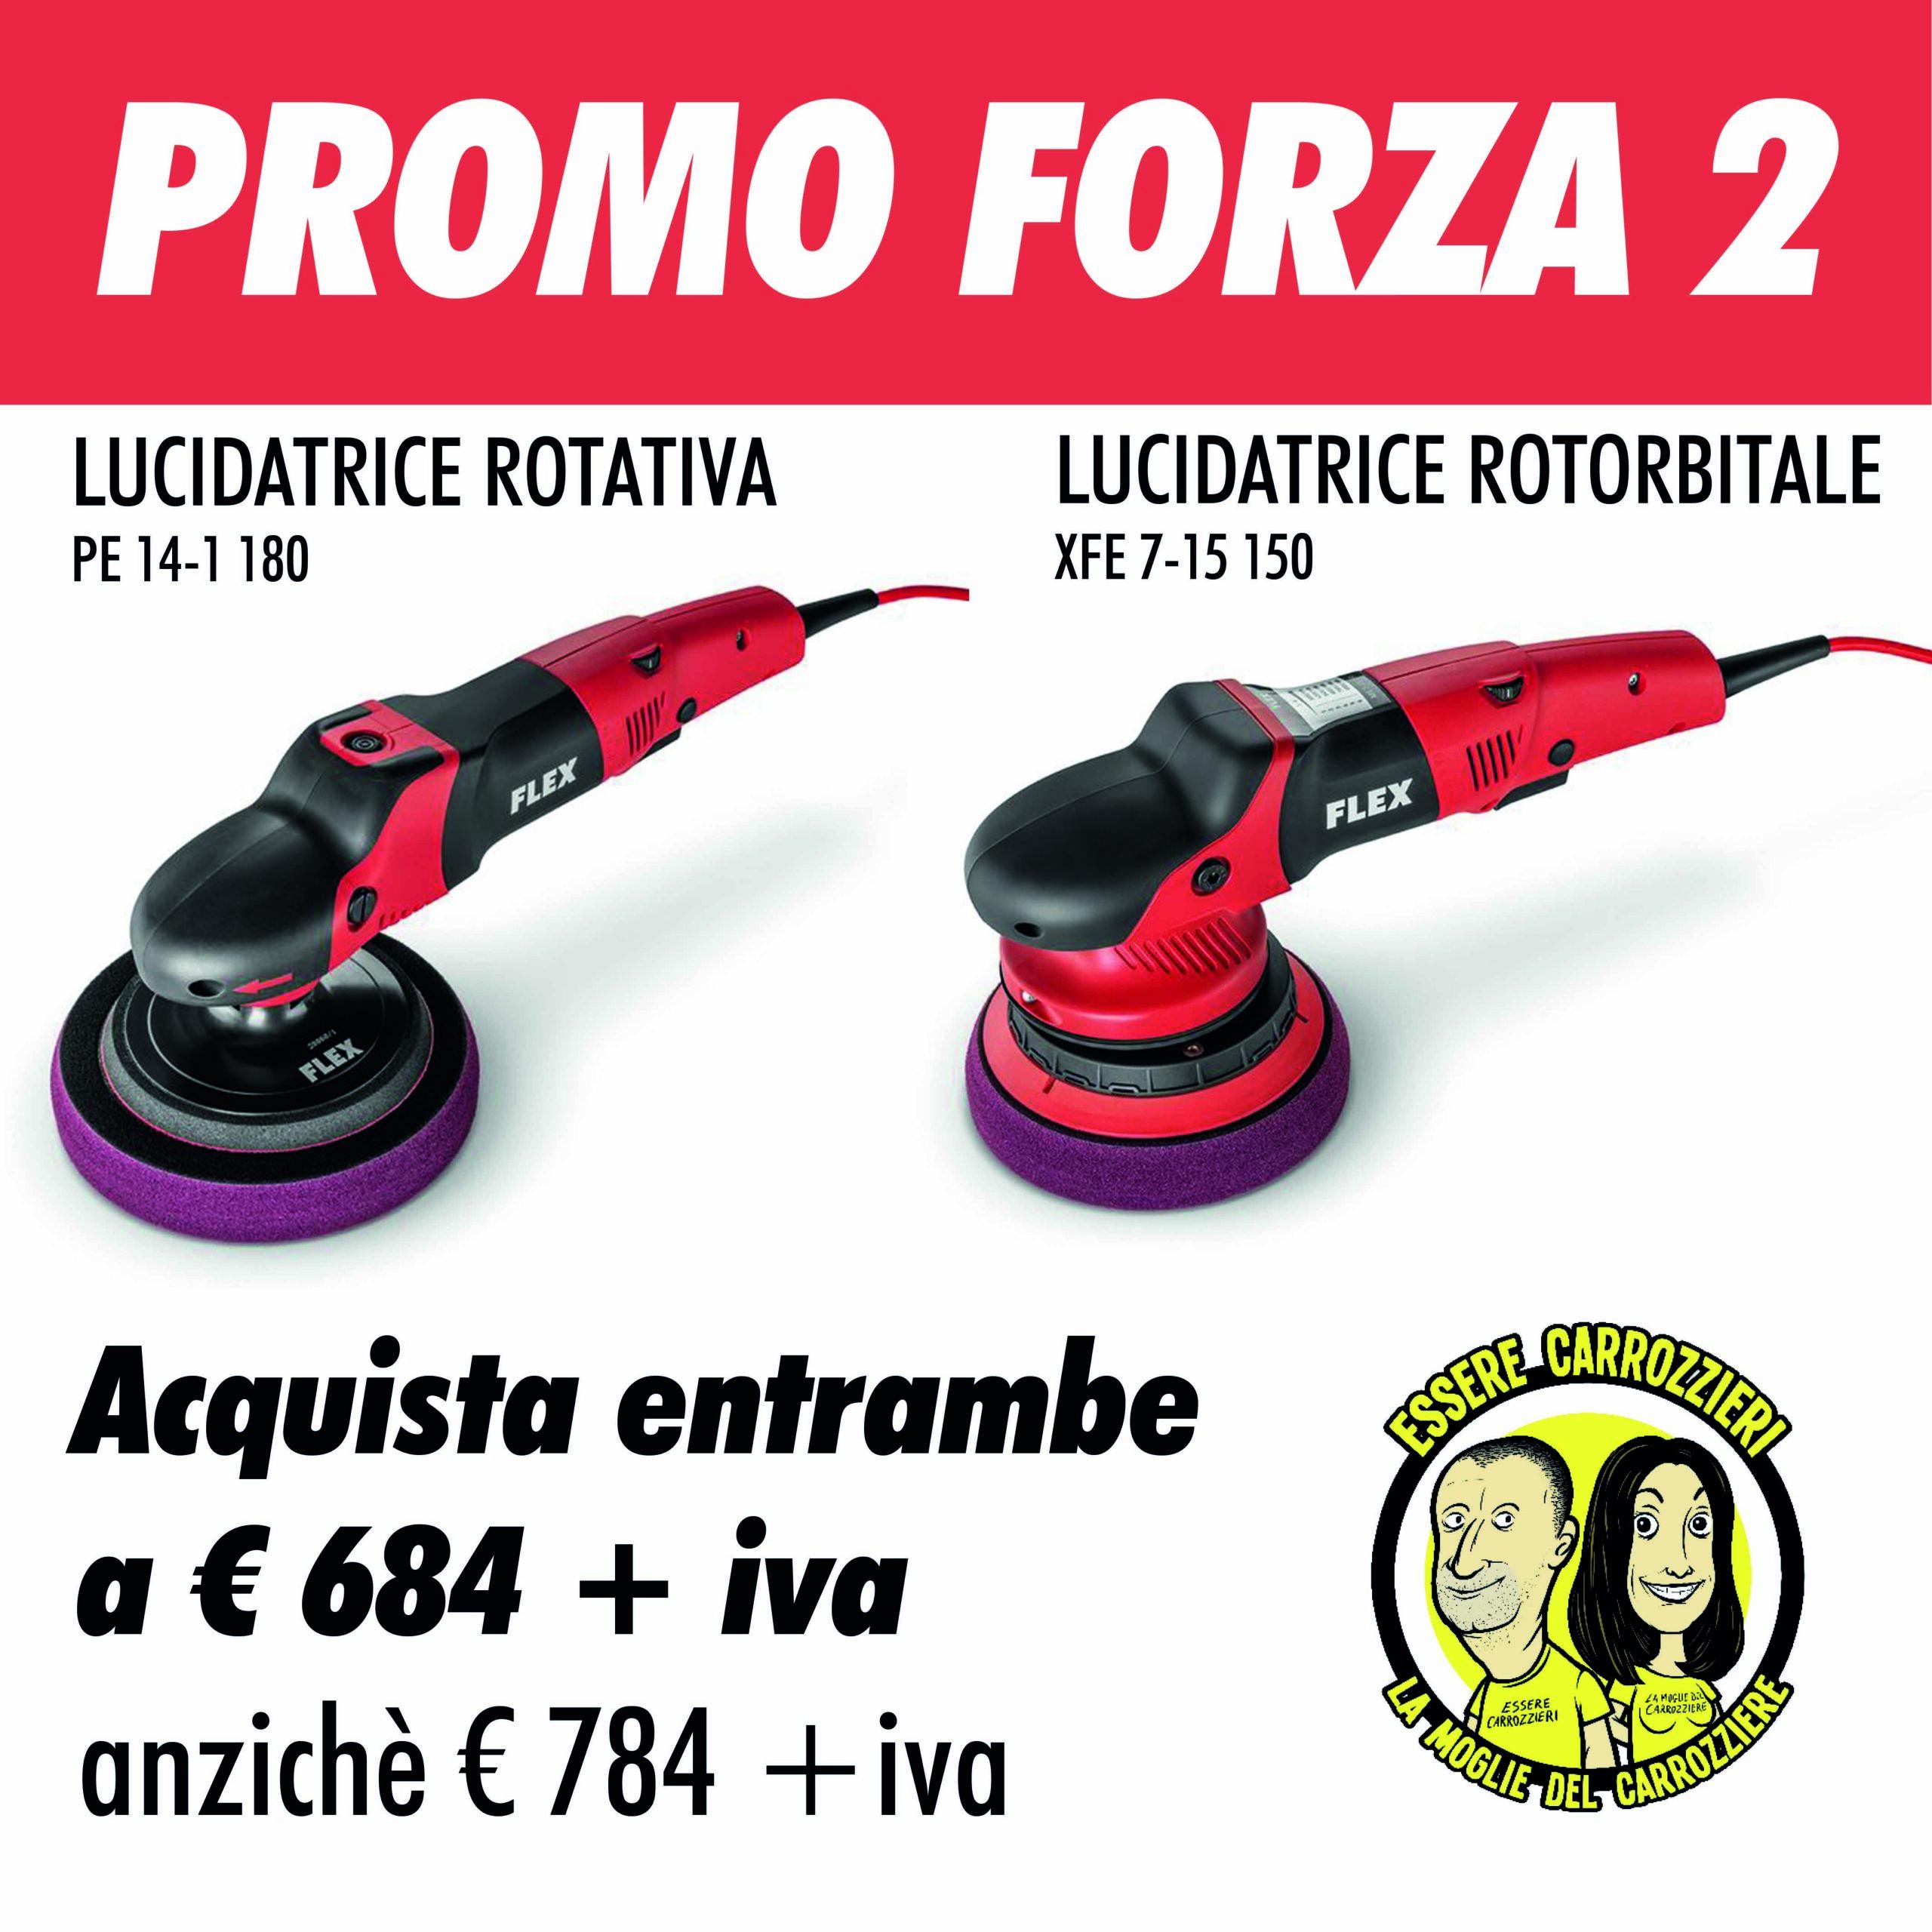 PROMO FORZA 2 - Lucidatrici Flex Rotativa+Rotorbitale